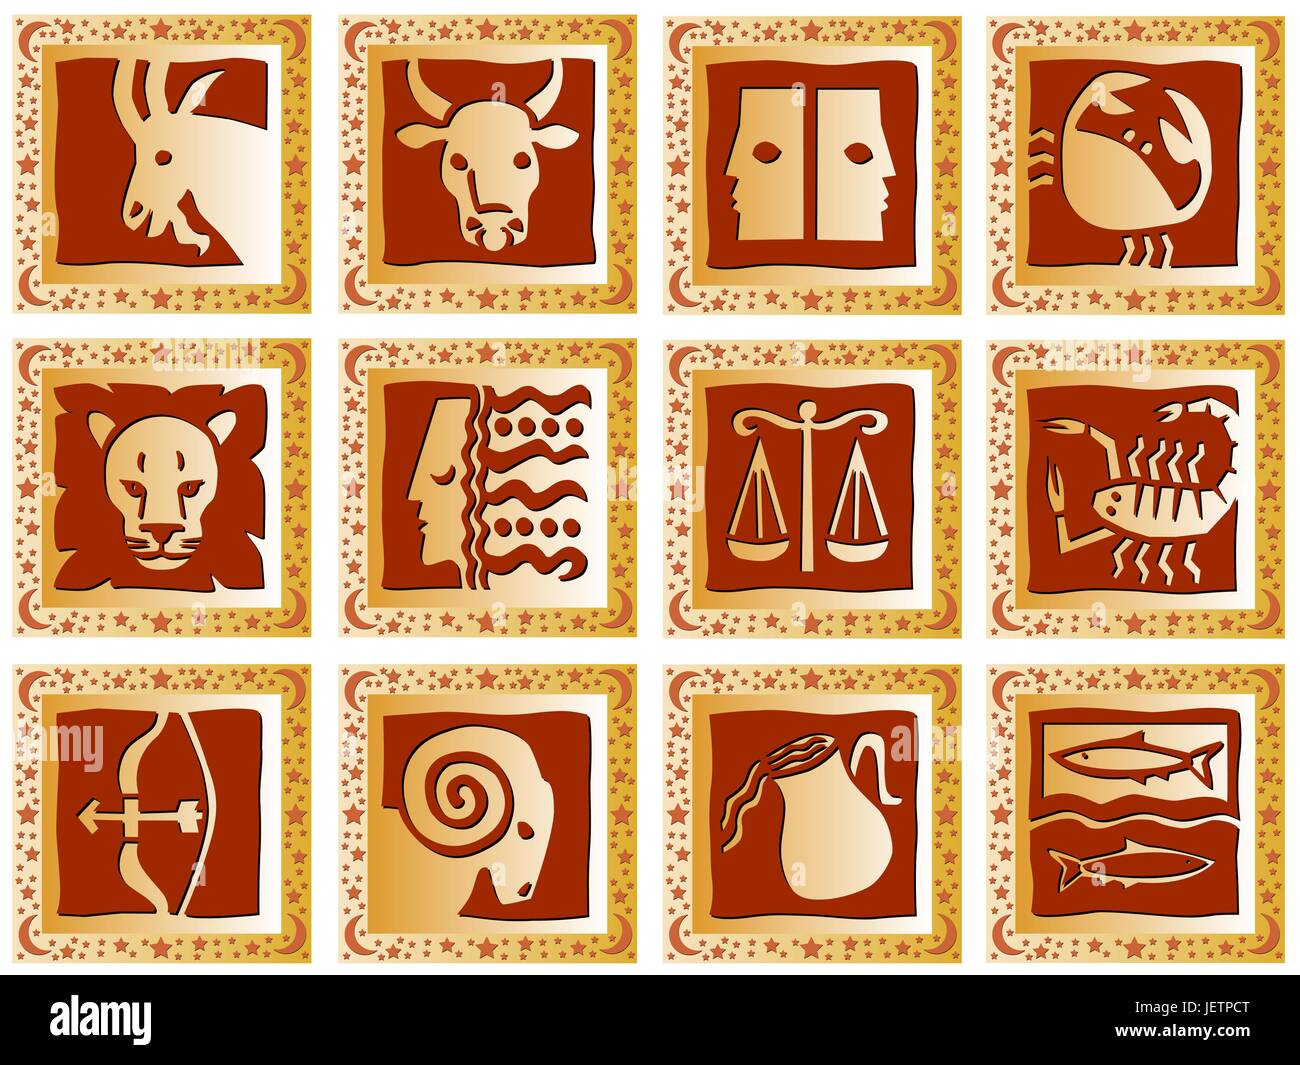 optional, mysticism, button, horoscope, sign of the zodiac, squares, destiny, - Stock Vector